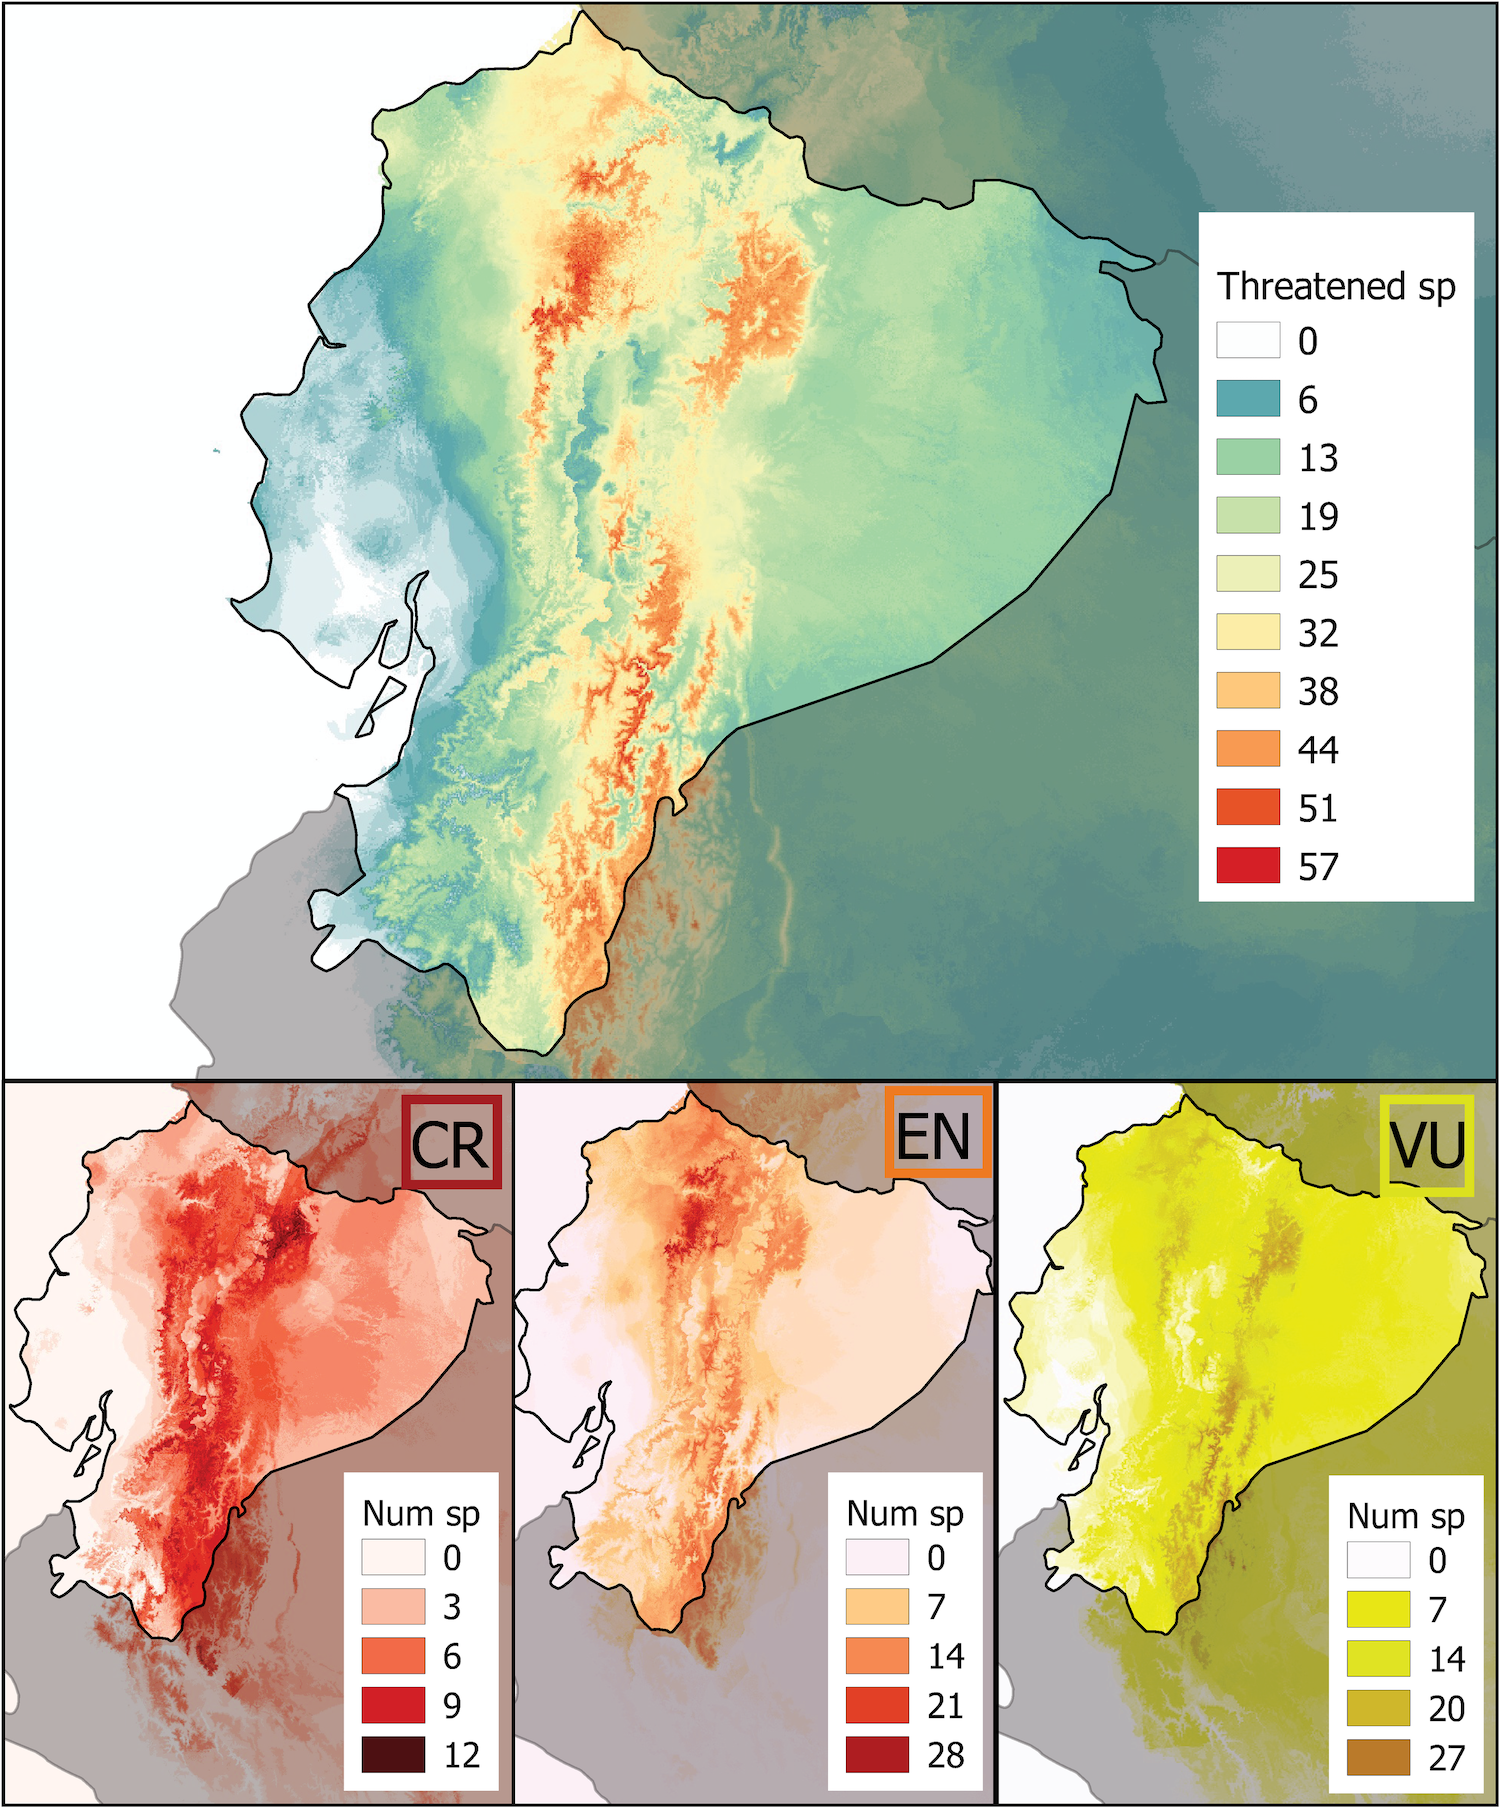 Riqueza acumulada de especies amenazadas por categoría de la Lista Roja. Imagen: Red List assessment of amphibian species of Ecuador: A multidimensional approach for their conservation.